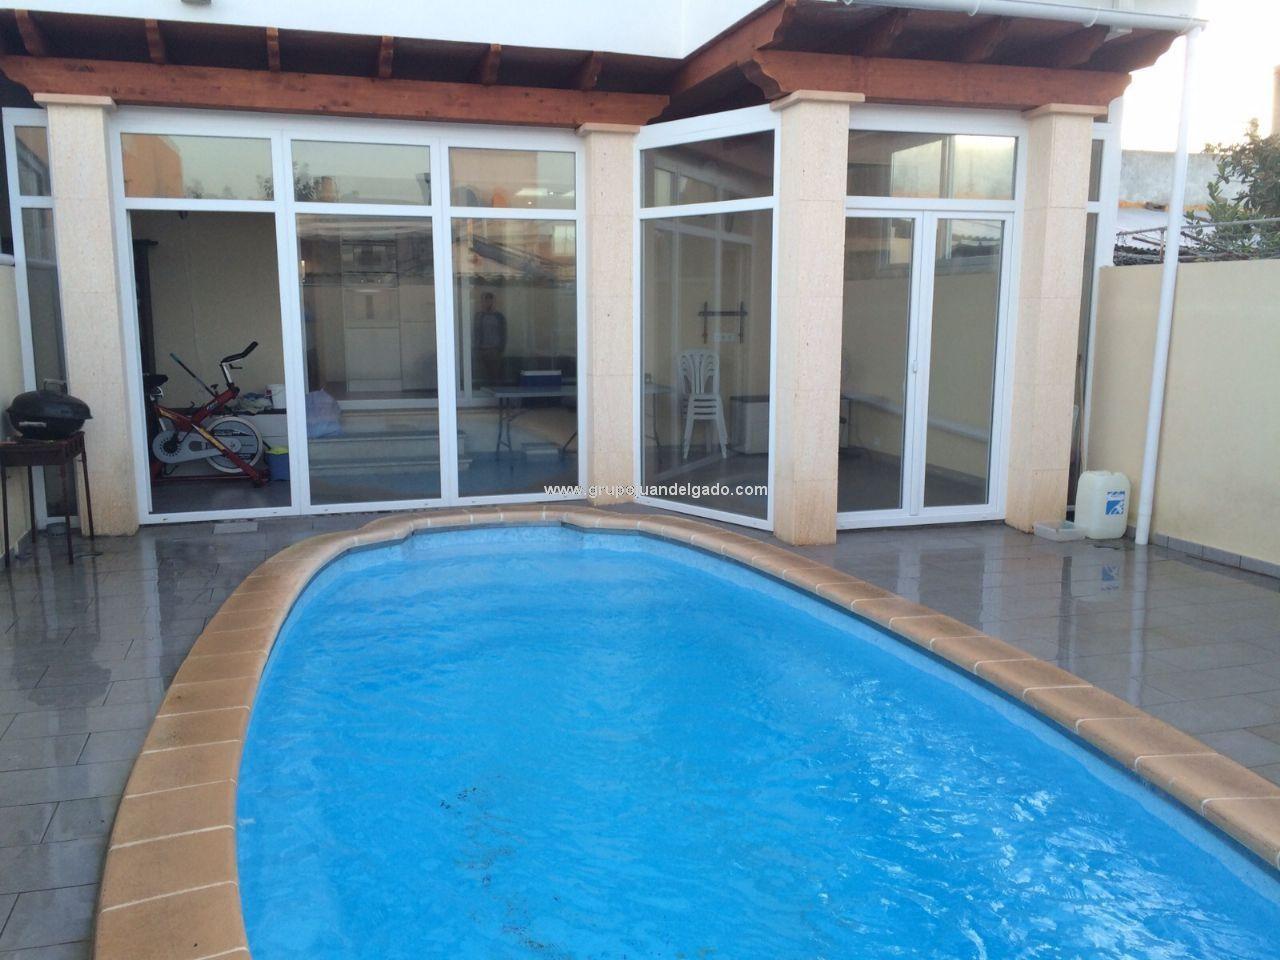 Servicios Inmobiliarios De Calidad En Mallorca